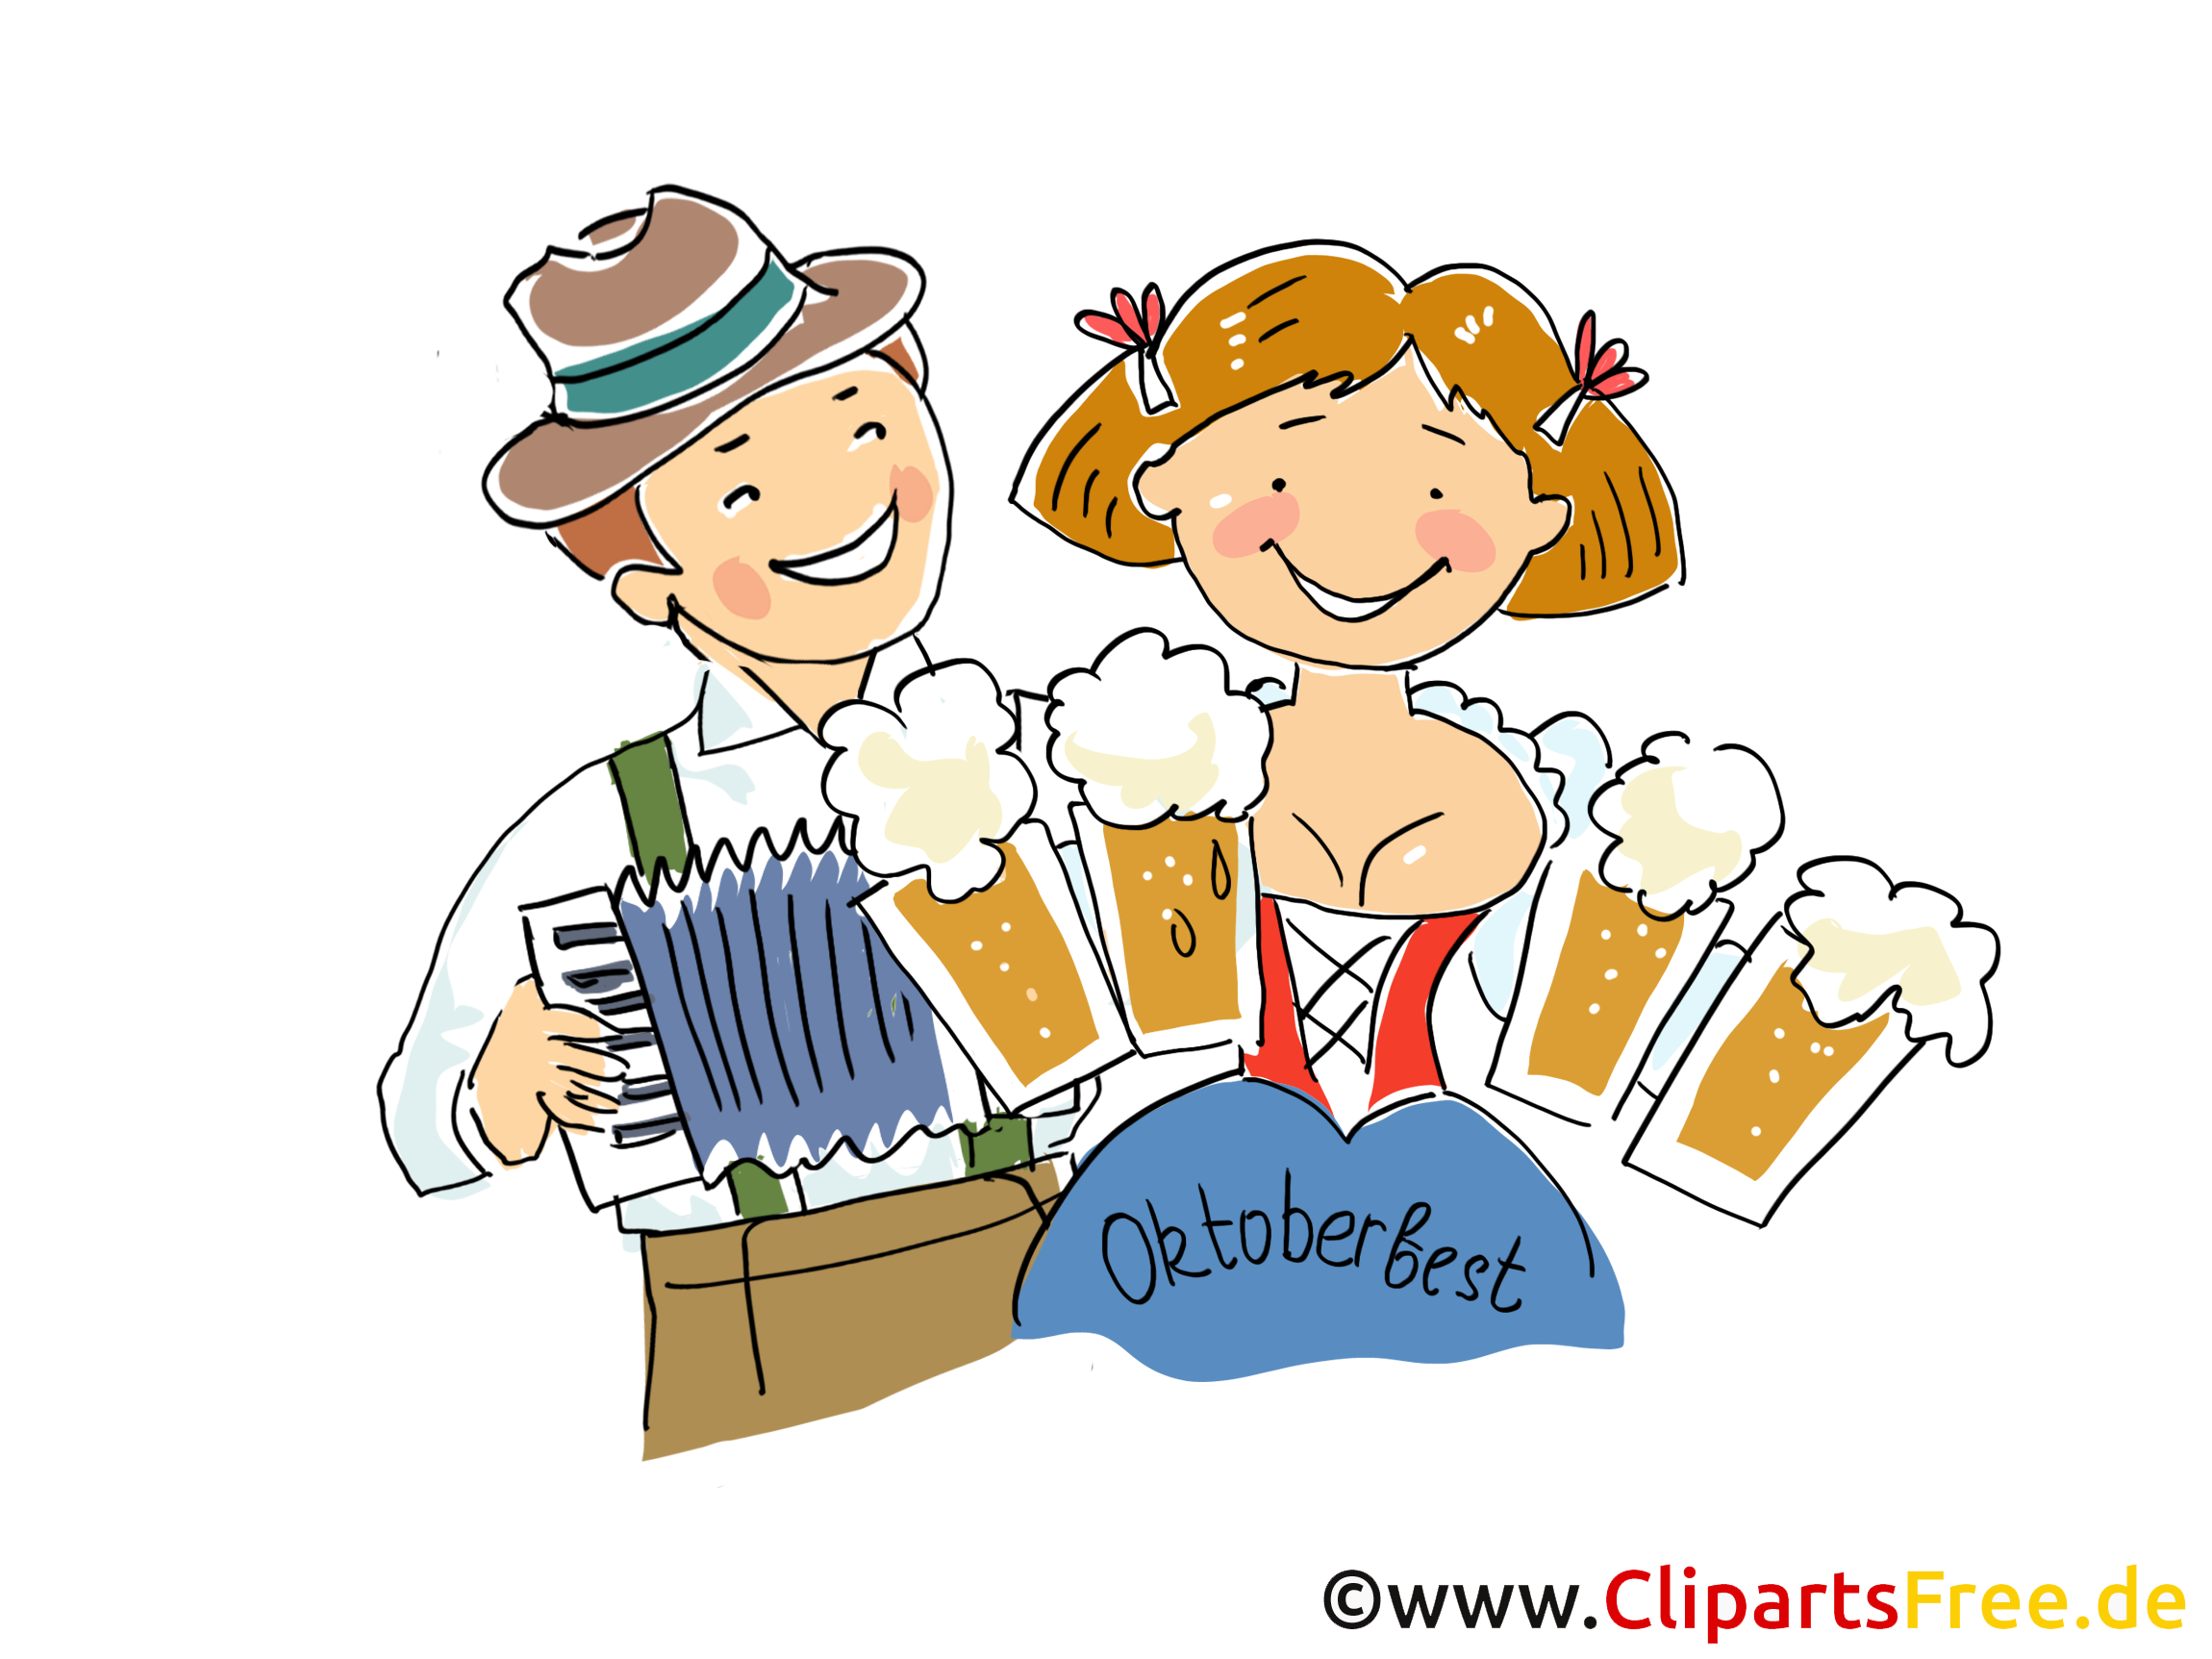 Clipart oktoberfest kostenlos.